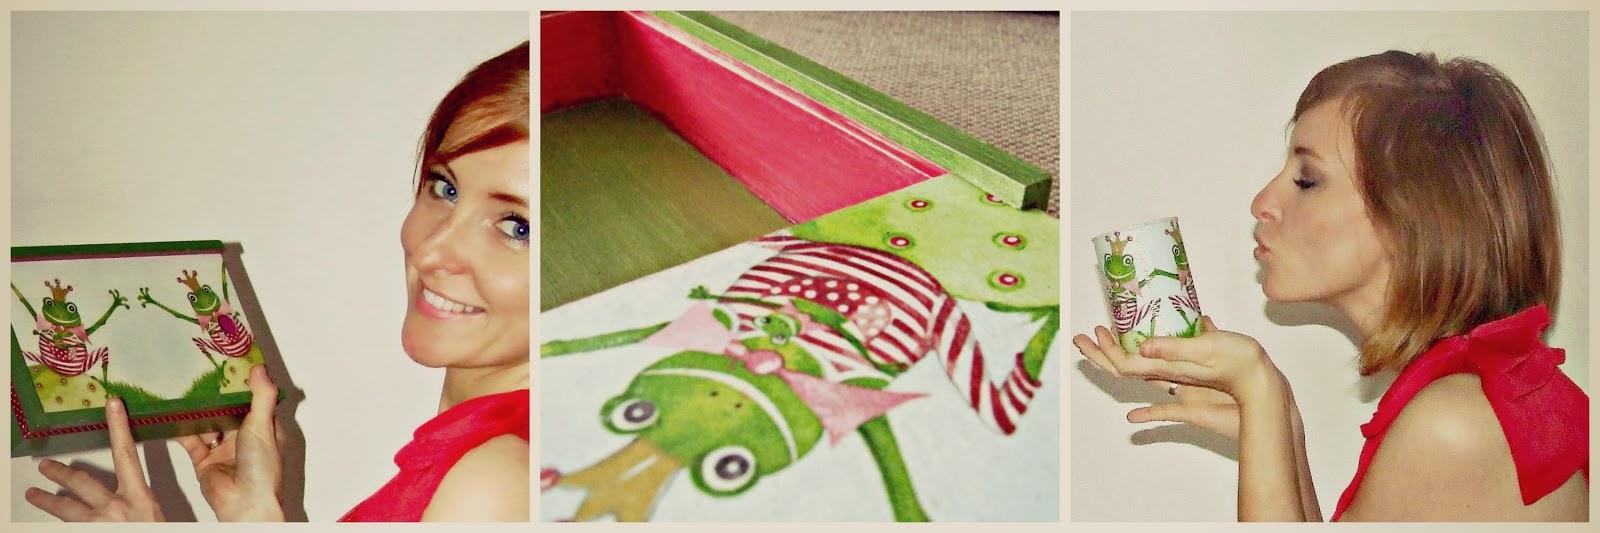 Sylwia Czubaj Eco Manufaktura kontakt blog o decoupage i hand made